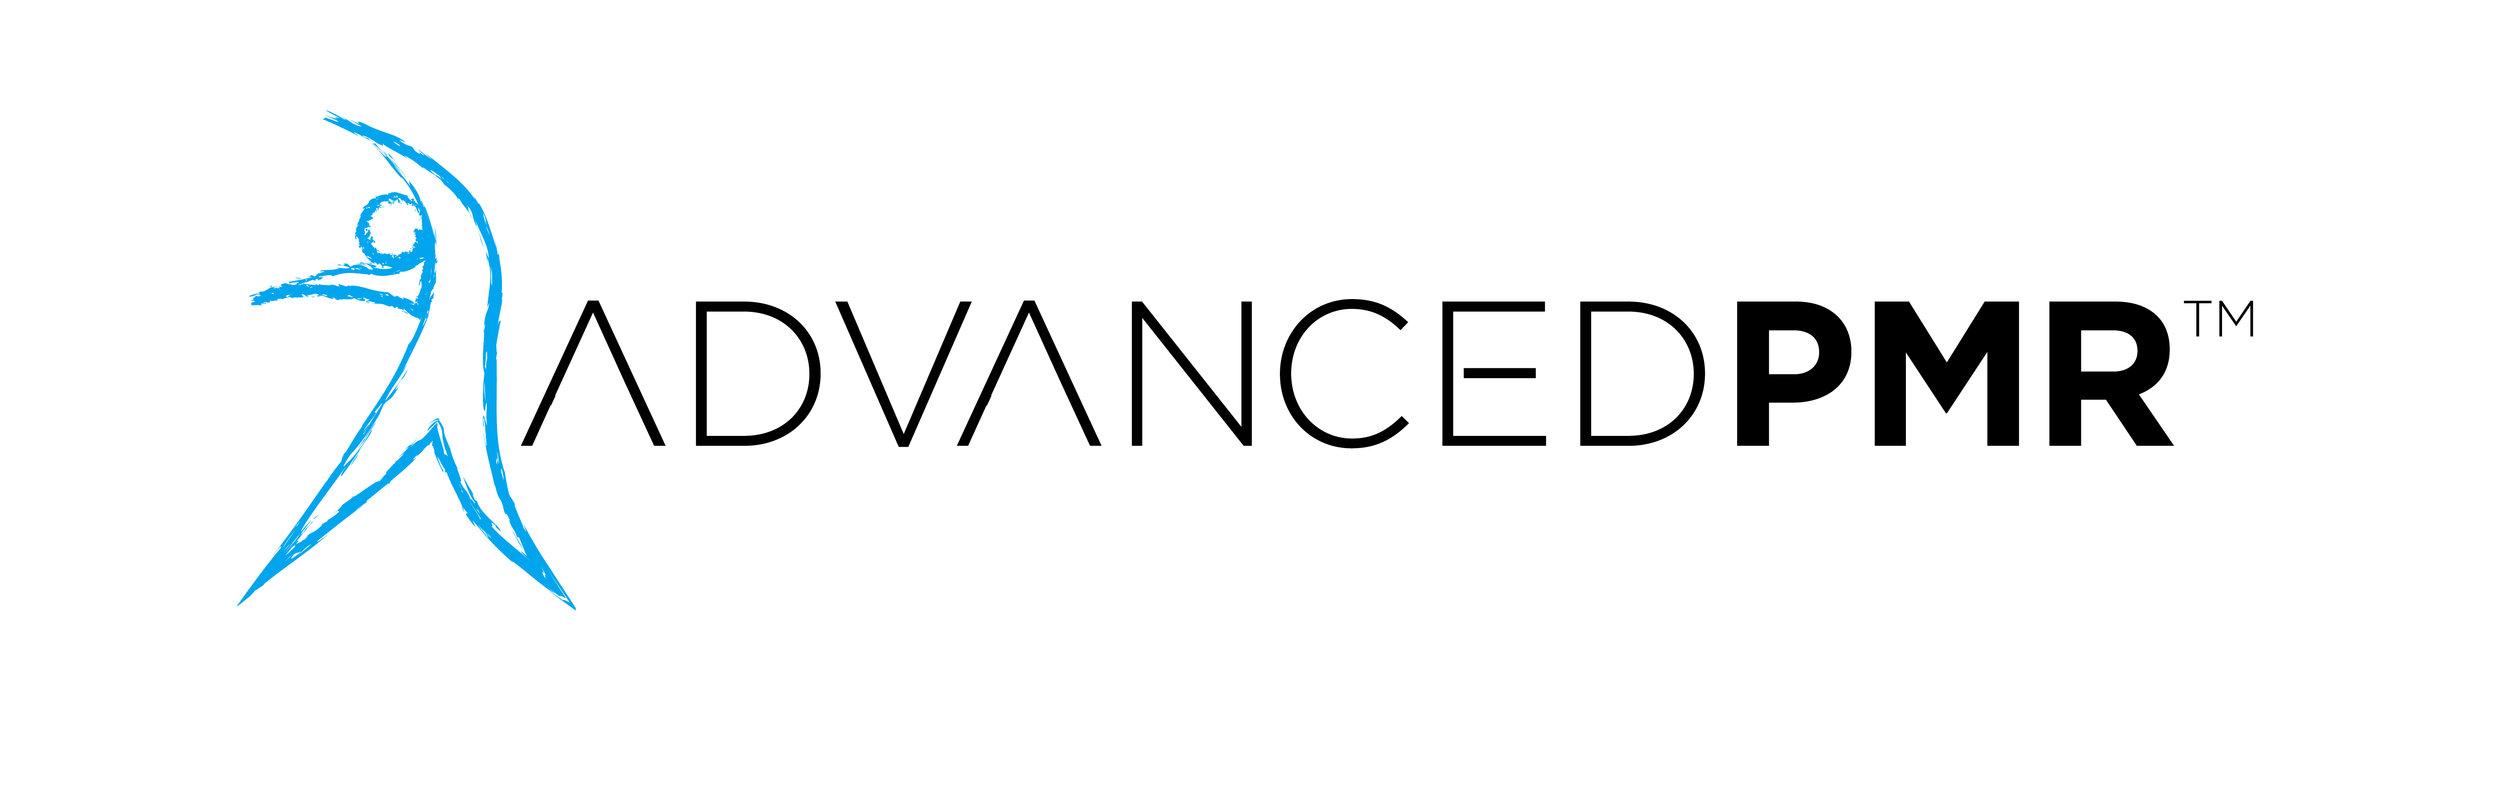 Advanced-PMR-logo-2018-final-1.jpg